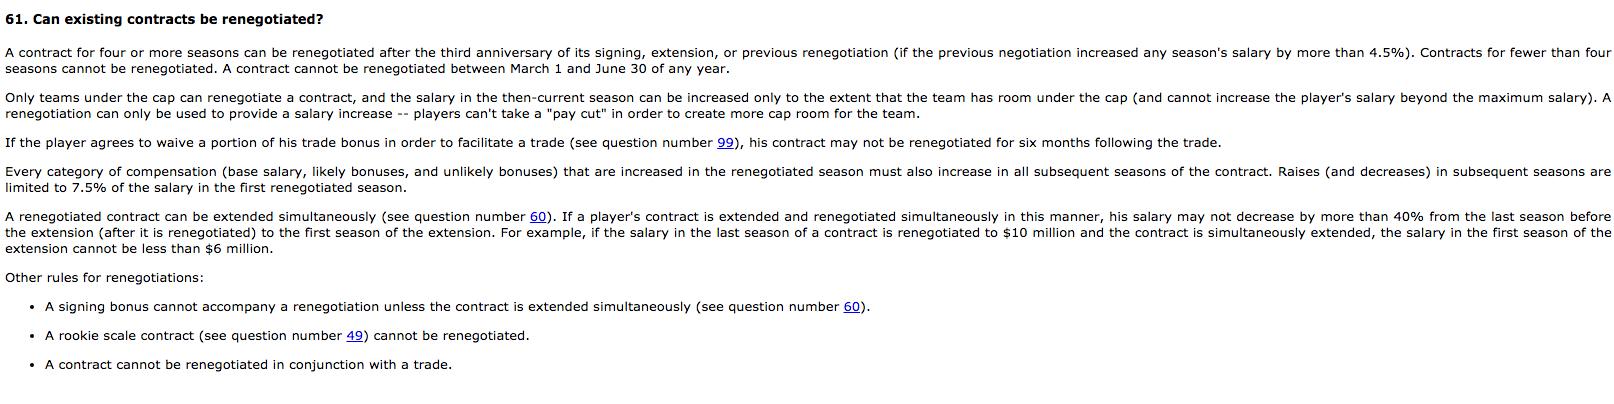 CBA FAQ 61